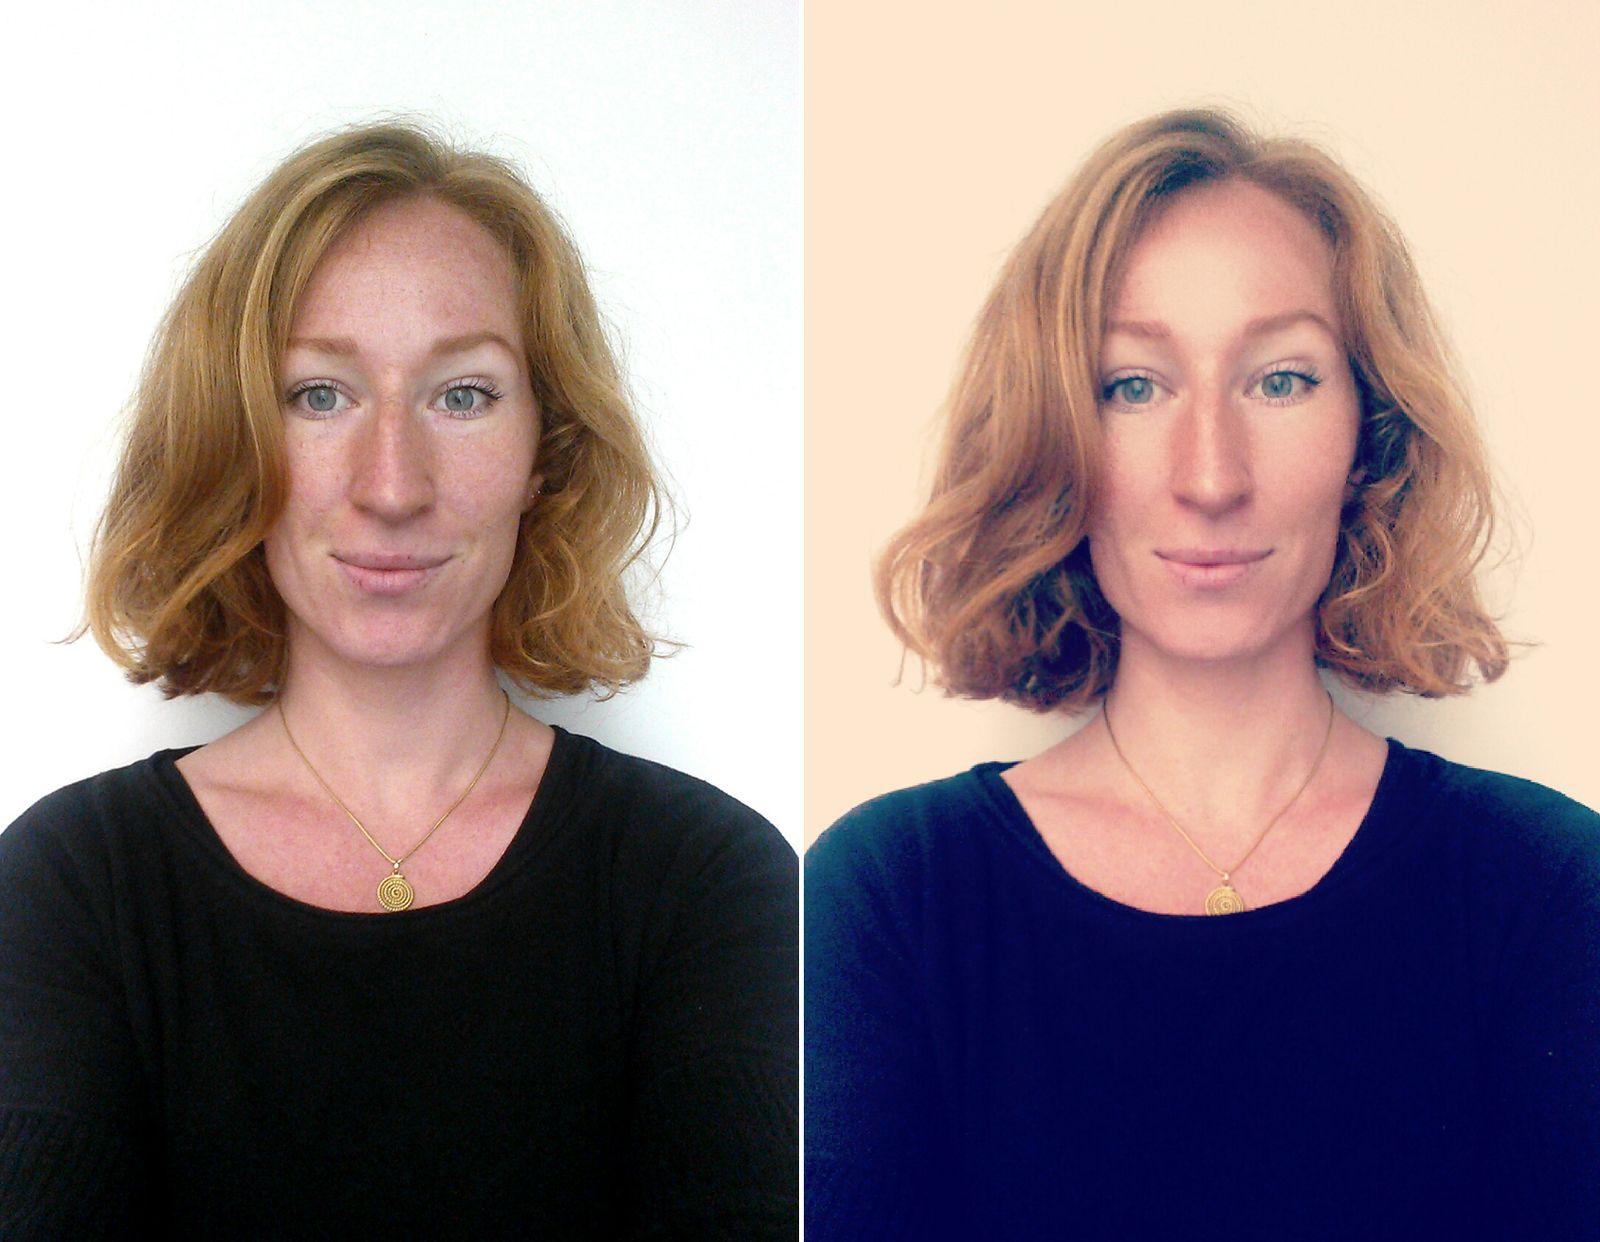 Beauty Filter/ Beauty Face/ Snapchat/ Samsung/ Teresa Sickert